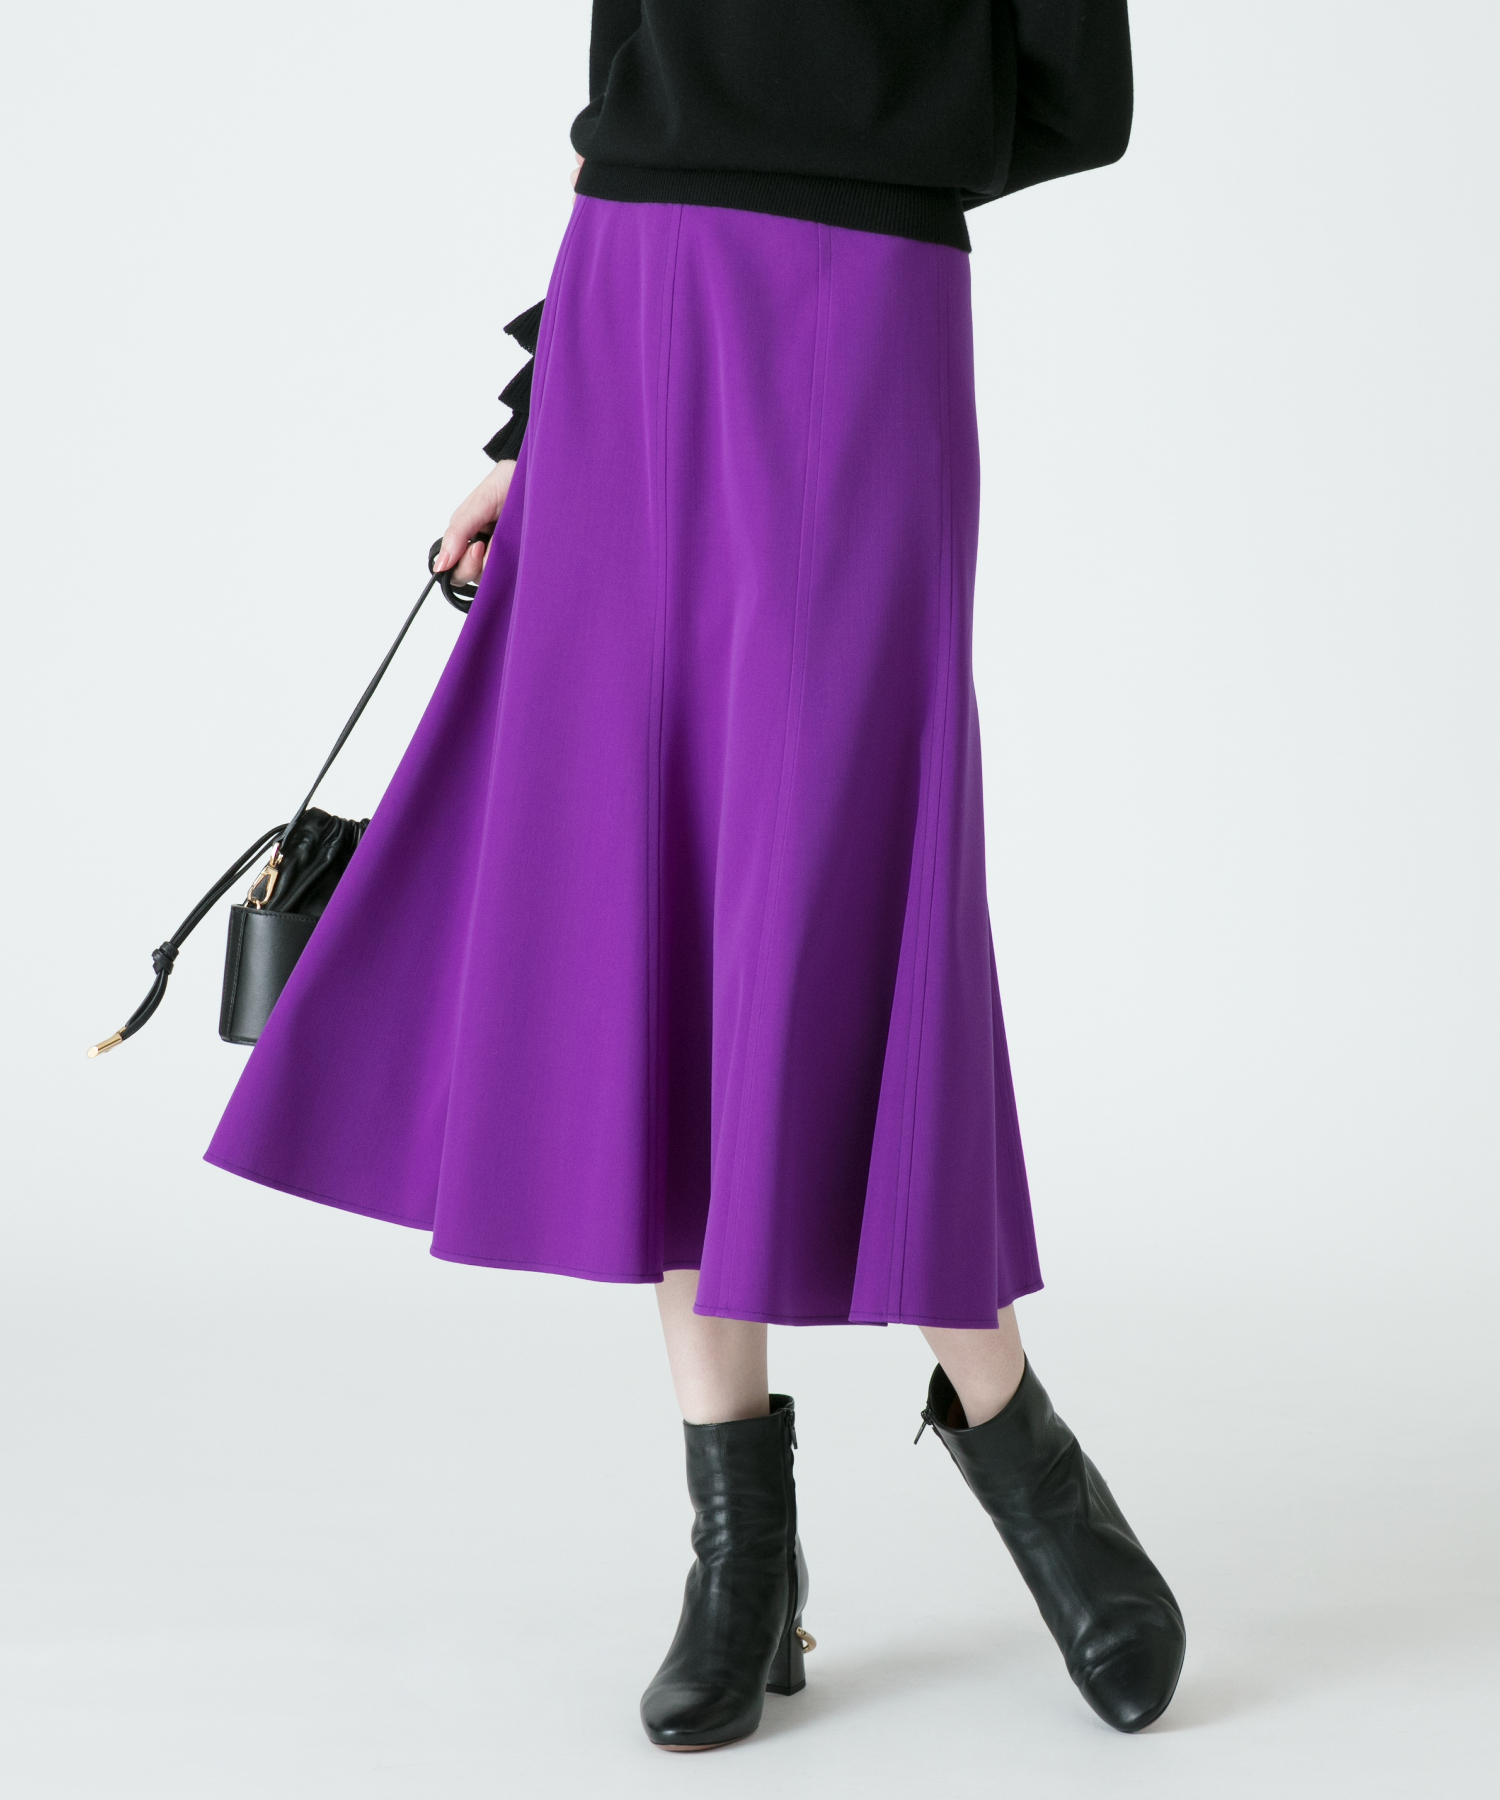 【Loulou Willoughby】ダブルクロスマーメイドスカート